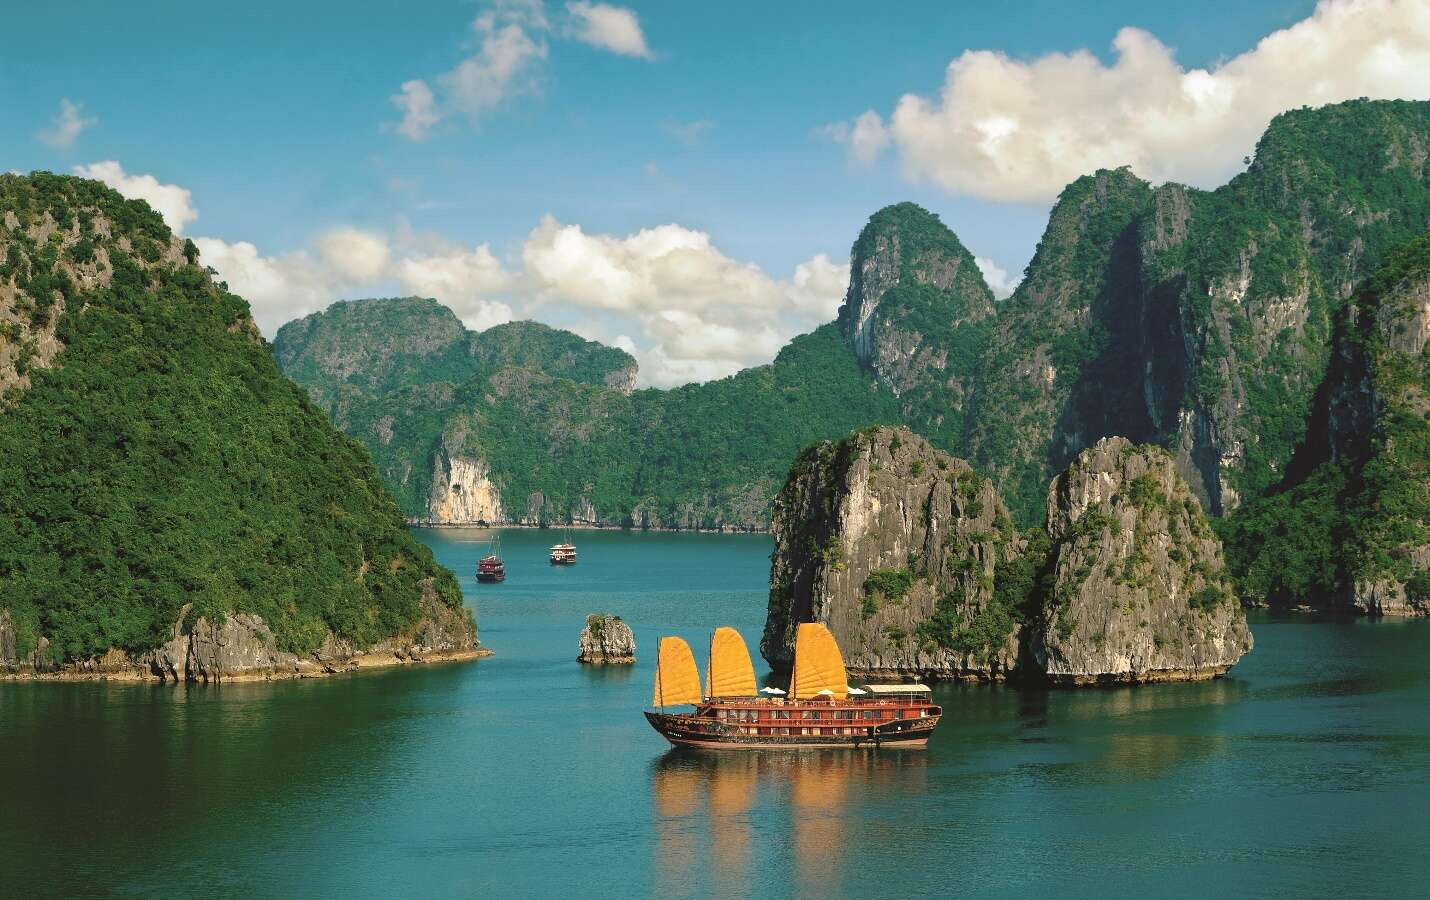 Fascinating Vietnam, Cambodia & the Mekong River with Hanoi, Ha Long Bay & Bangkok